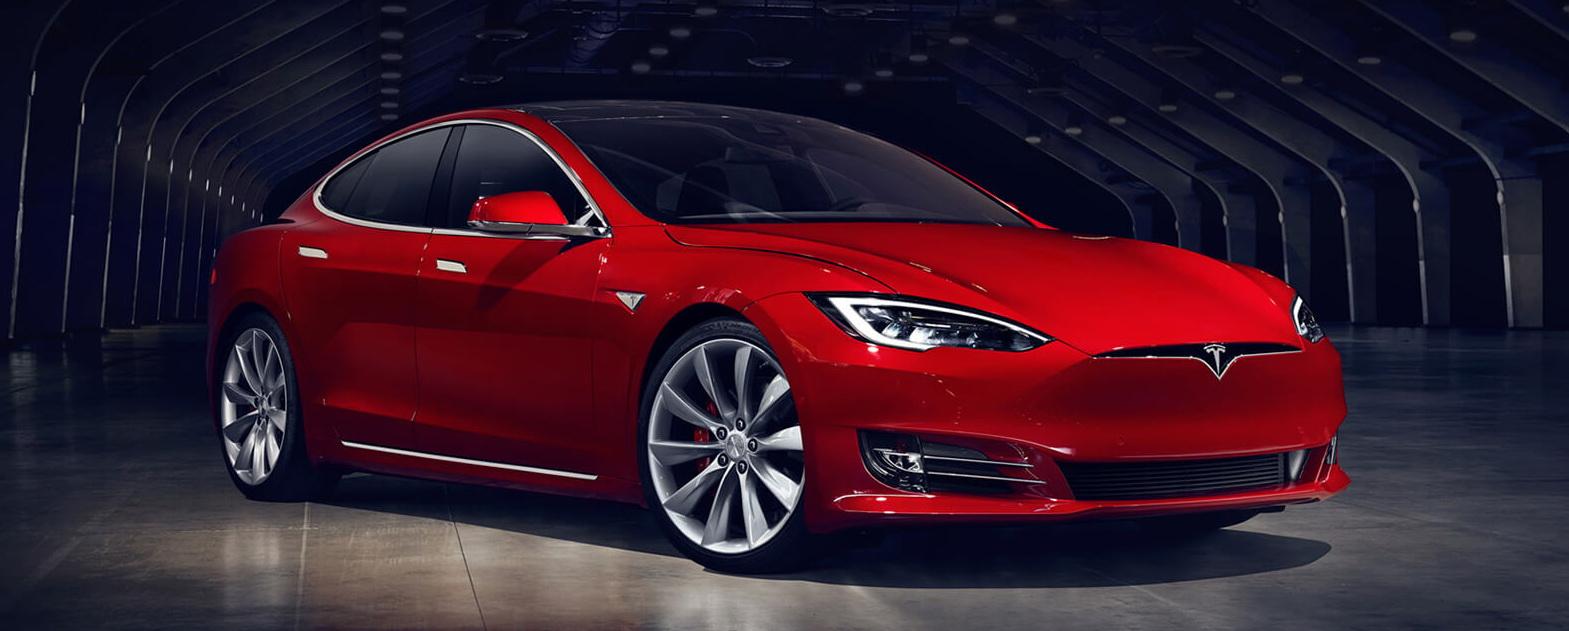 Tesla-Model-S-2017MY1 (1).jpg